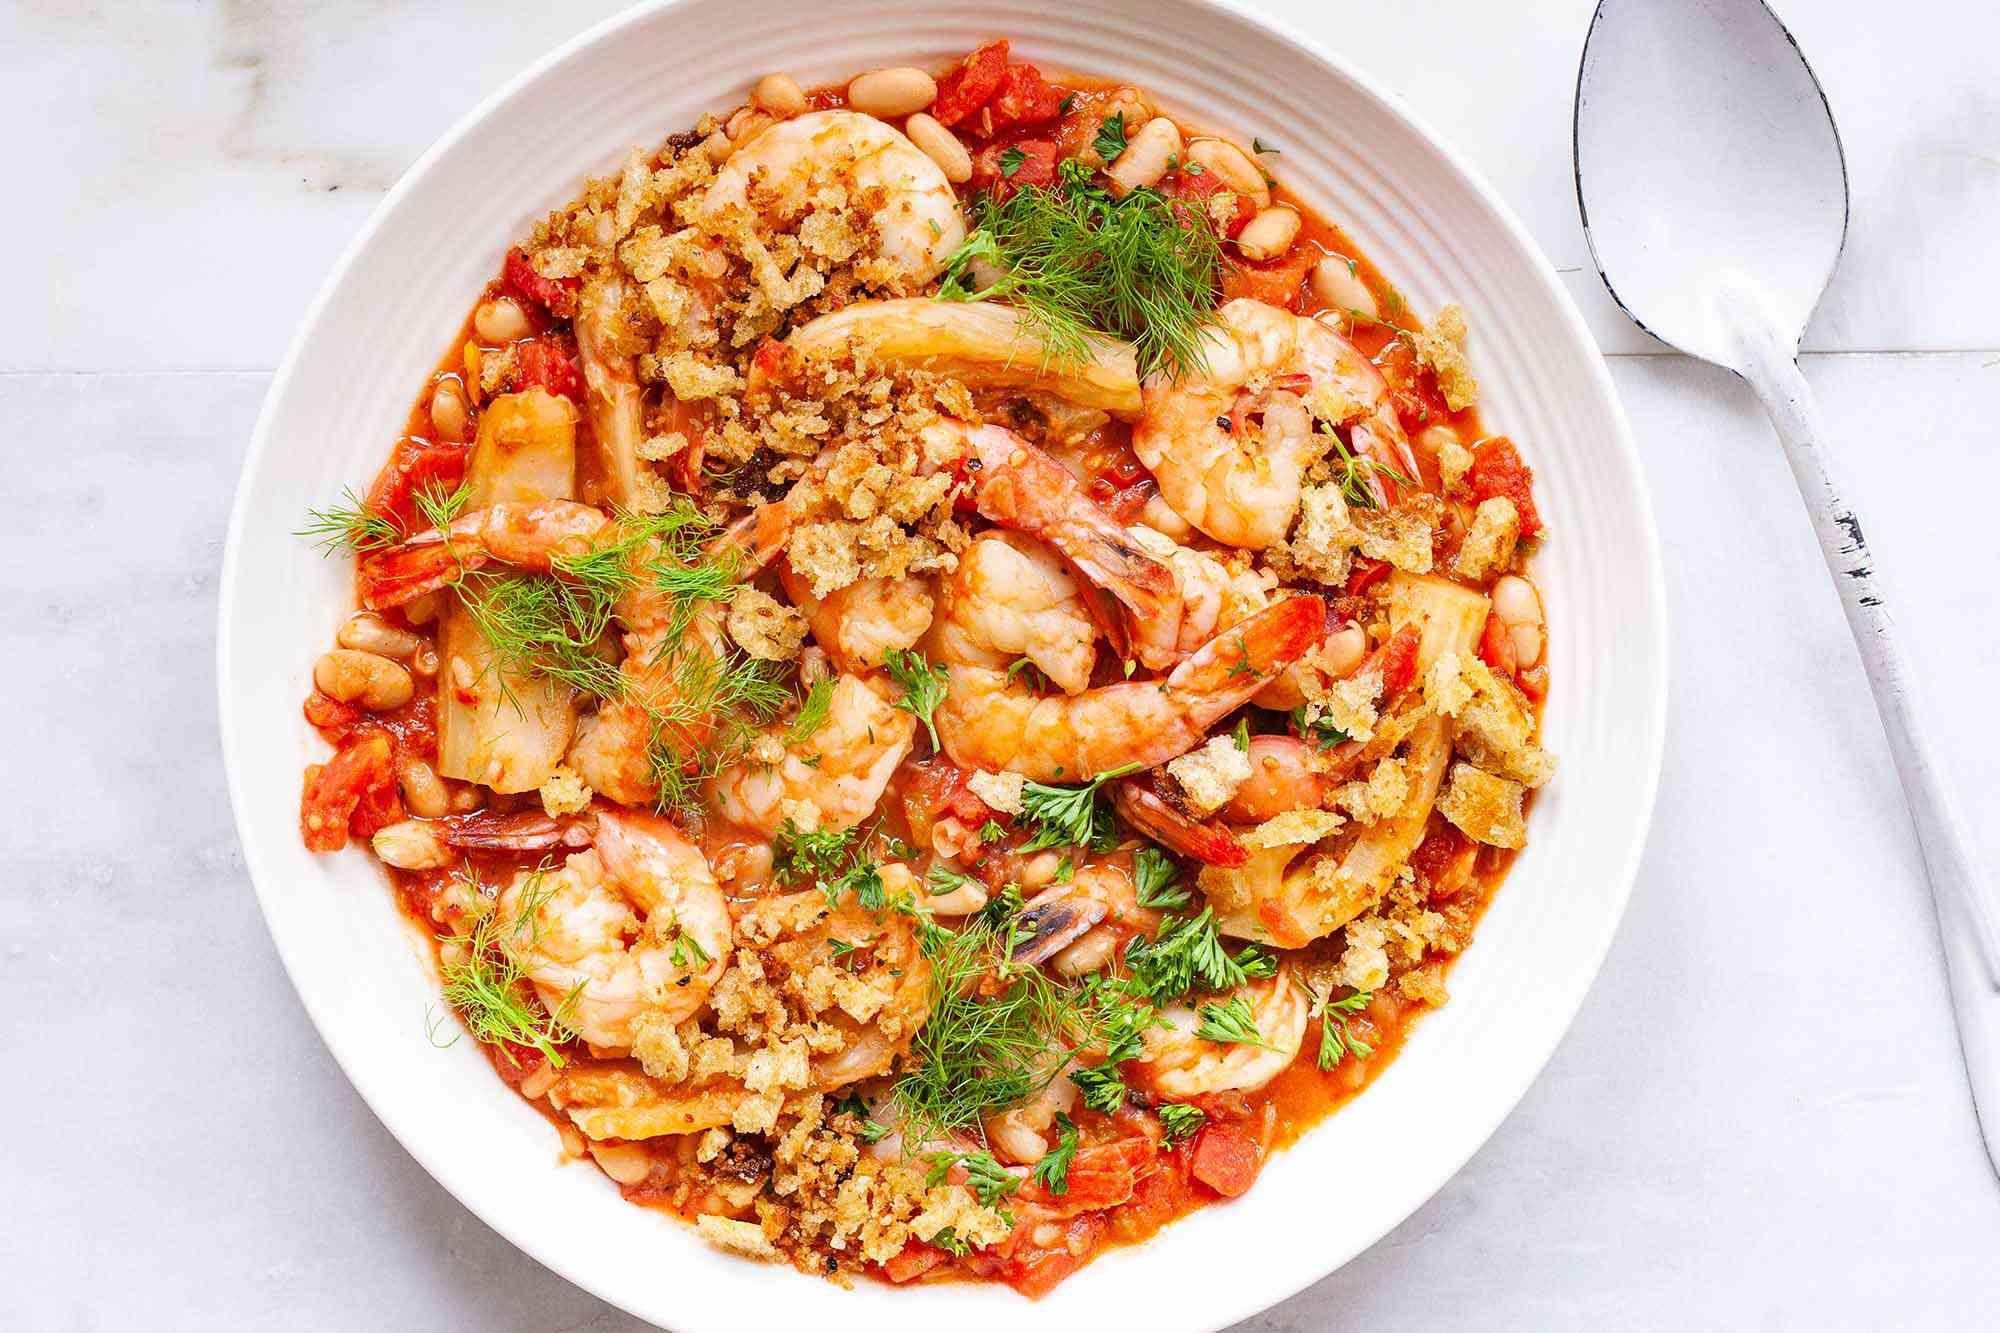 Shrimp and Vegetable Skillet Dinner - beans, fennel, tomato and shrimp skillet